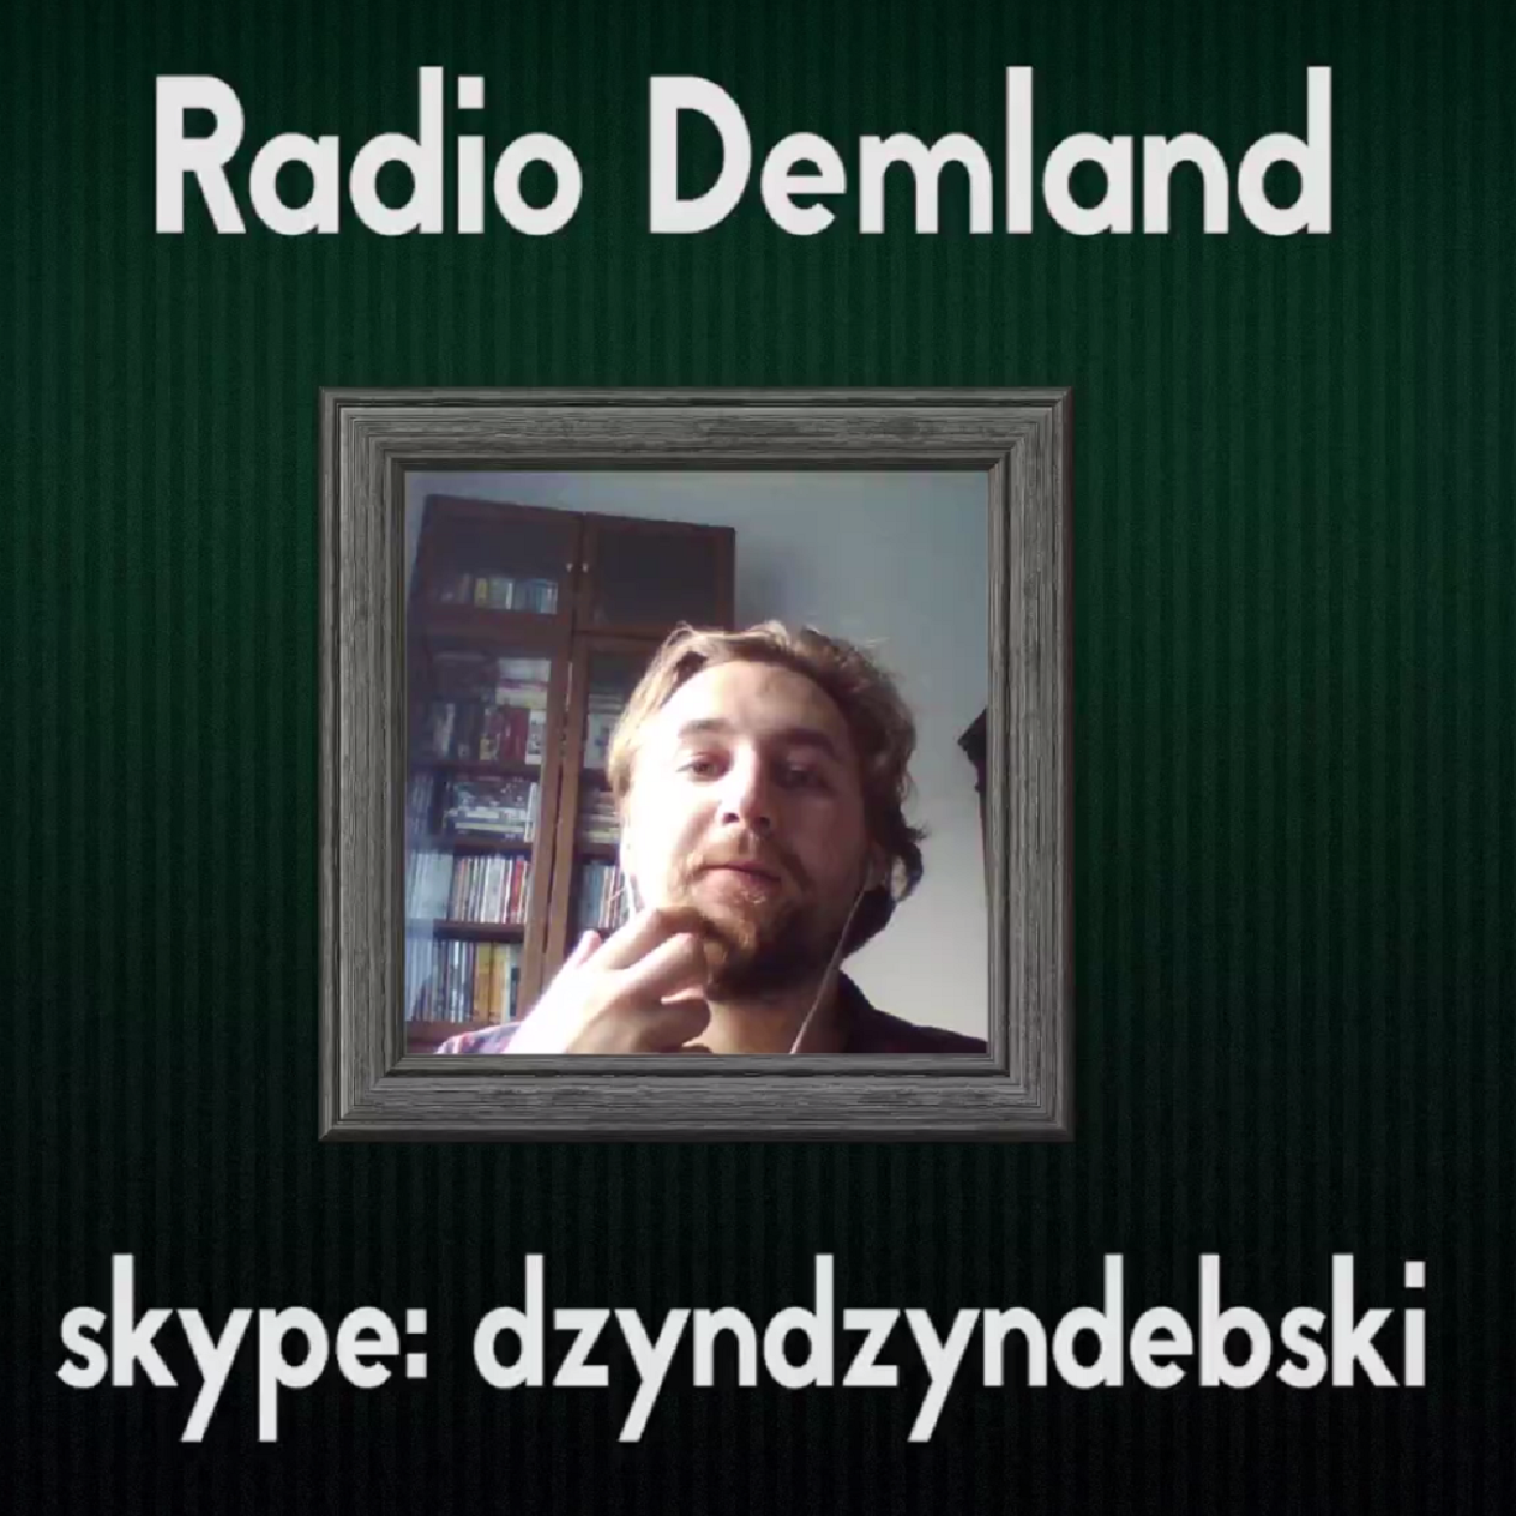 Radio Demland